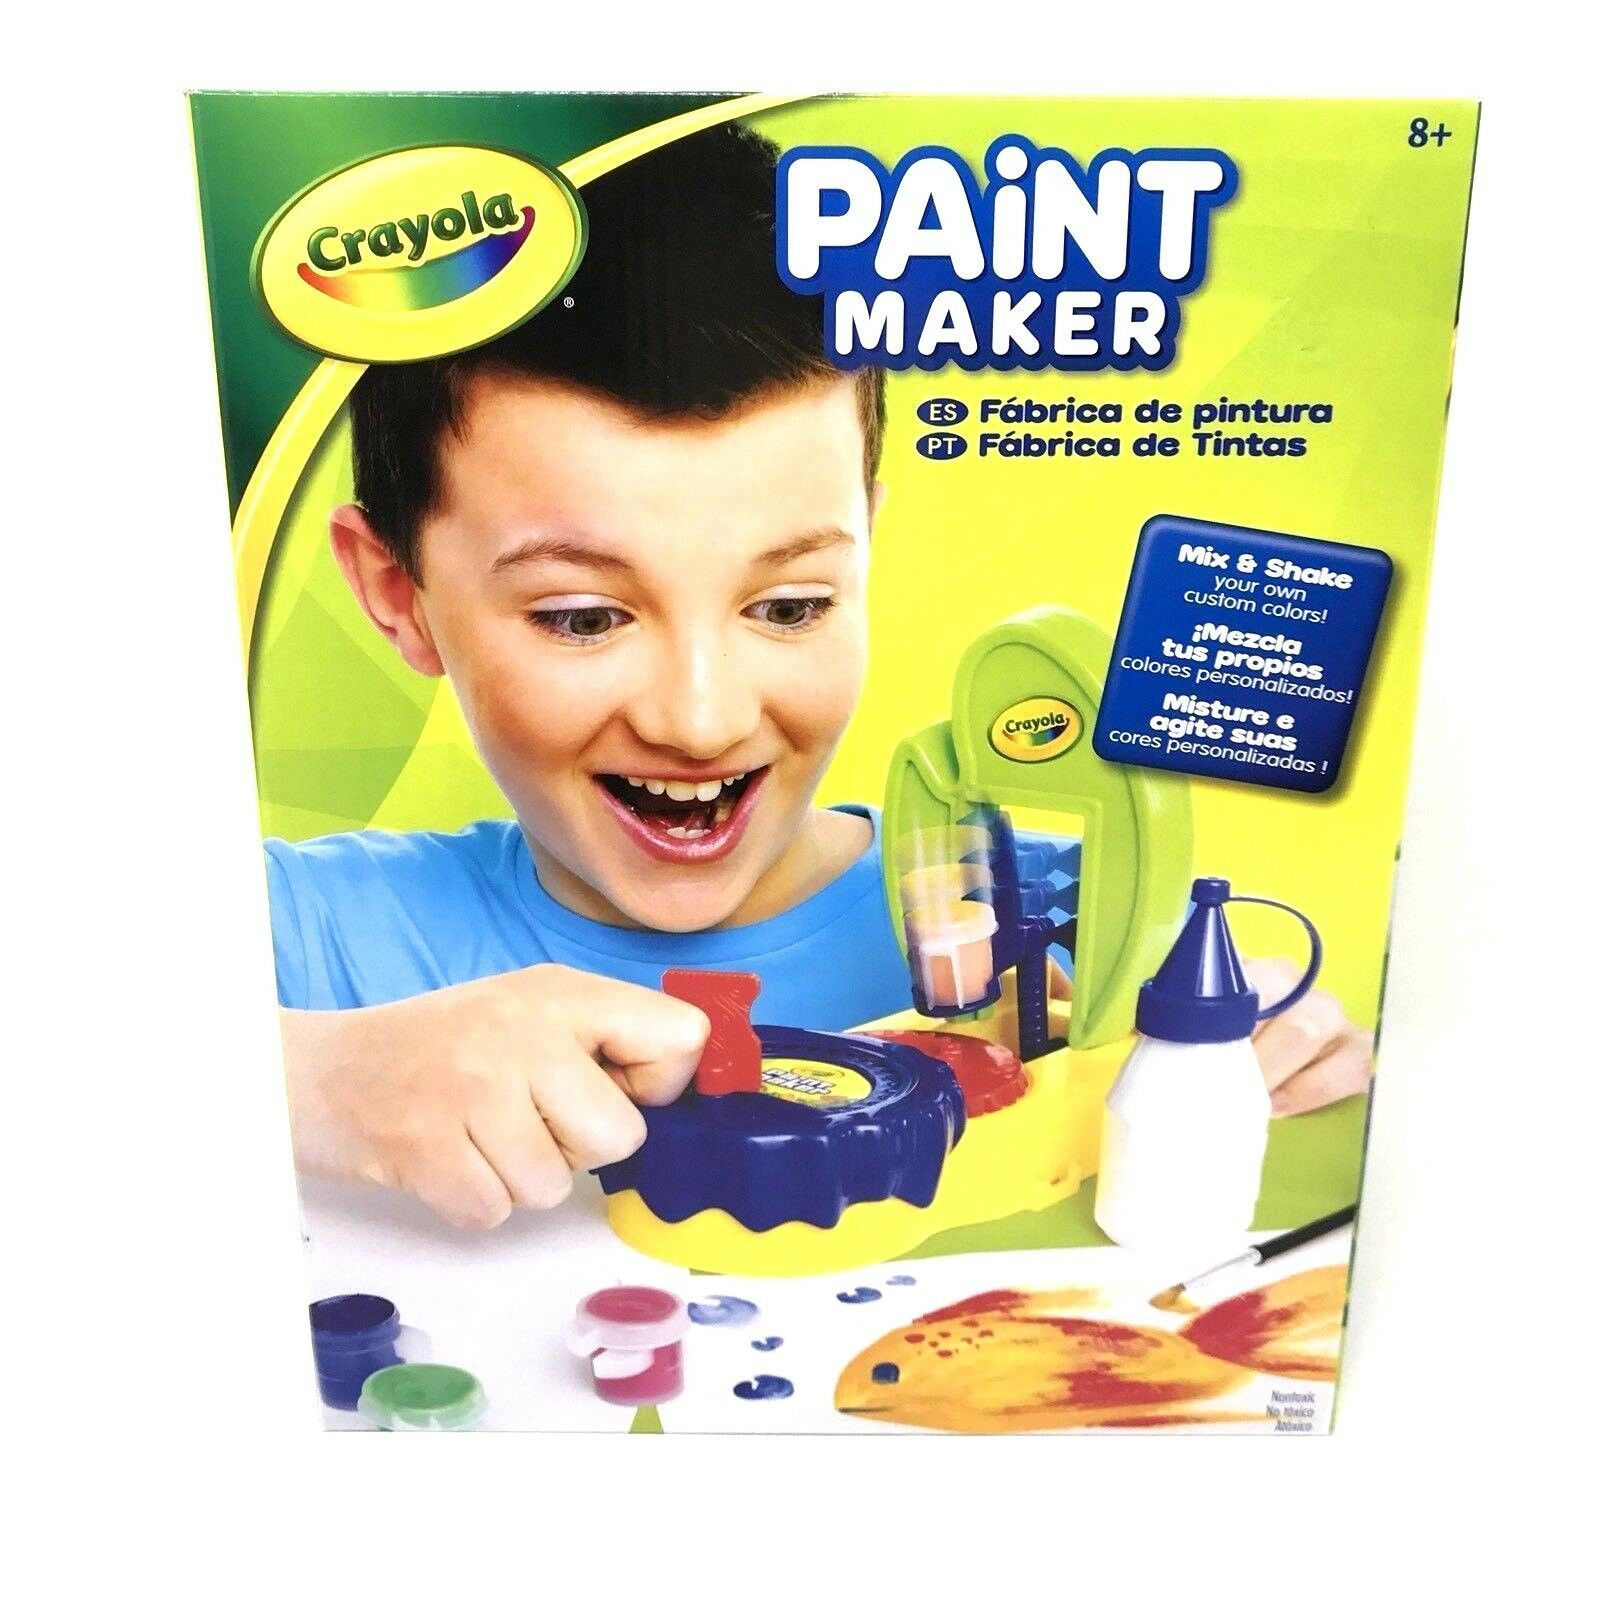 Crayola Paint Maker Activity Set Nontoxic Ages 8+ Arts and Crafts Kids - $56.19